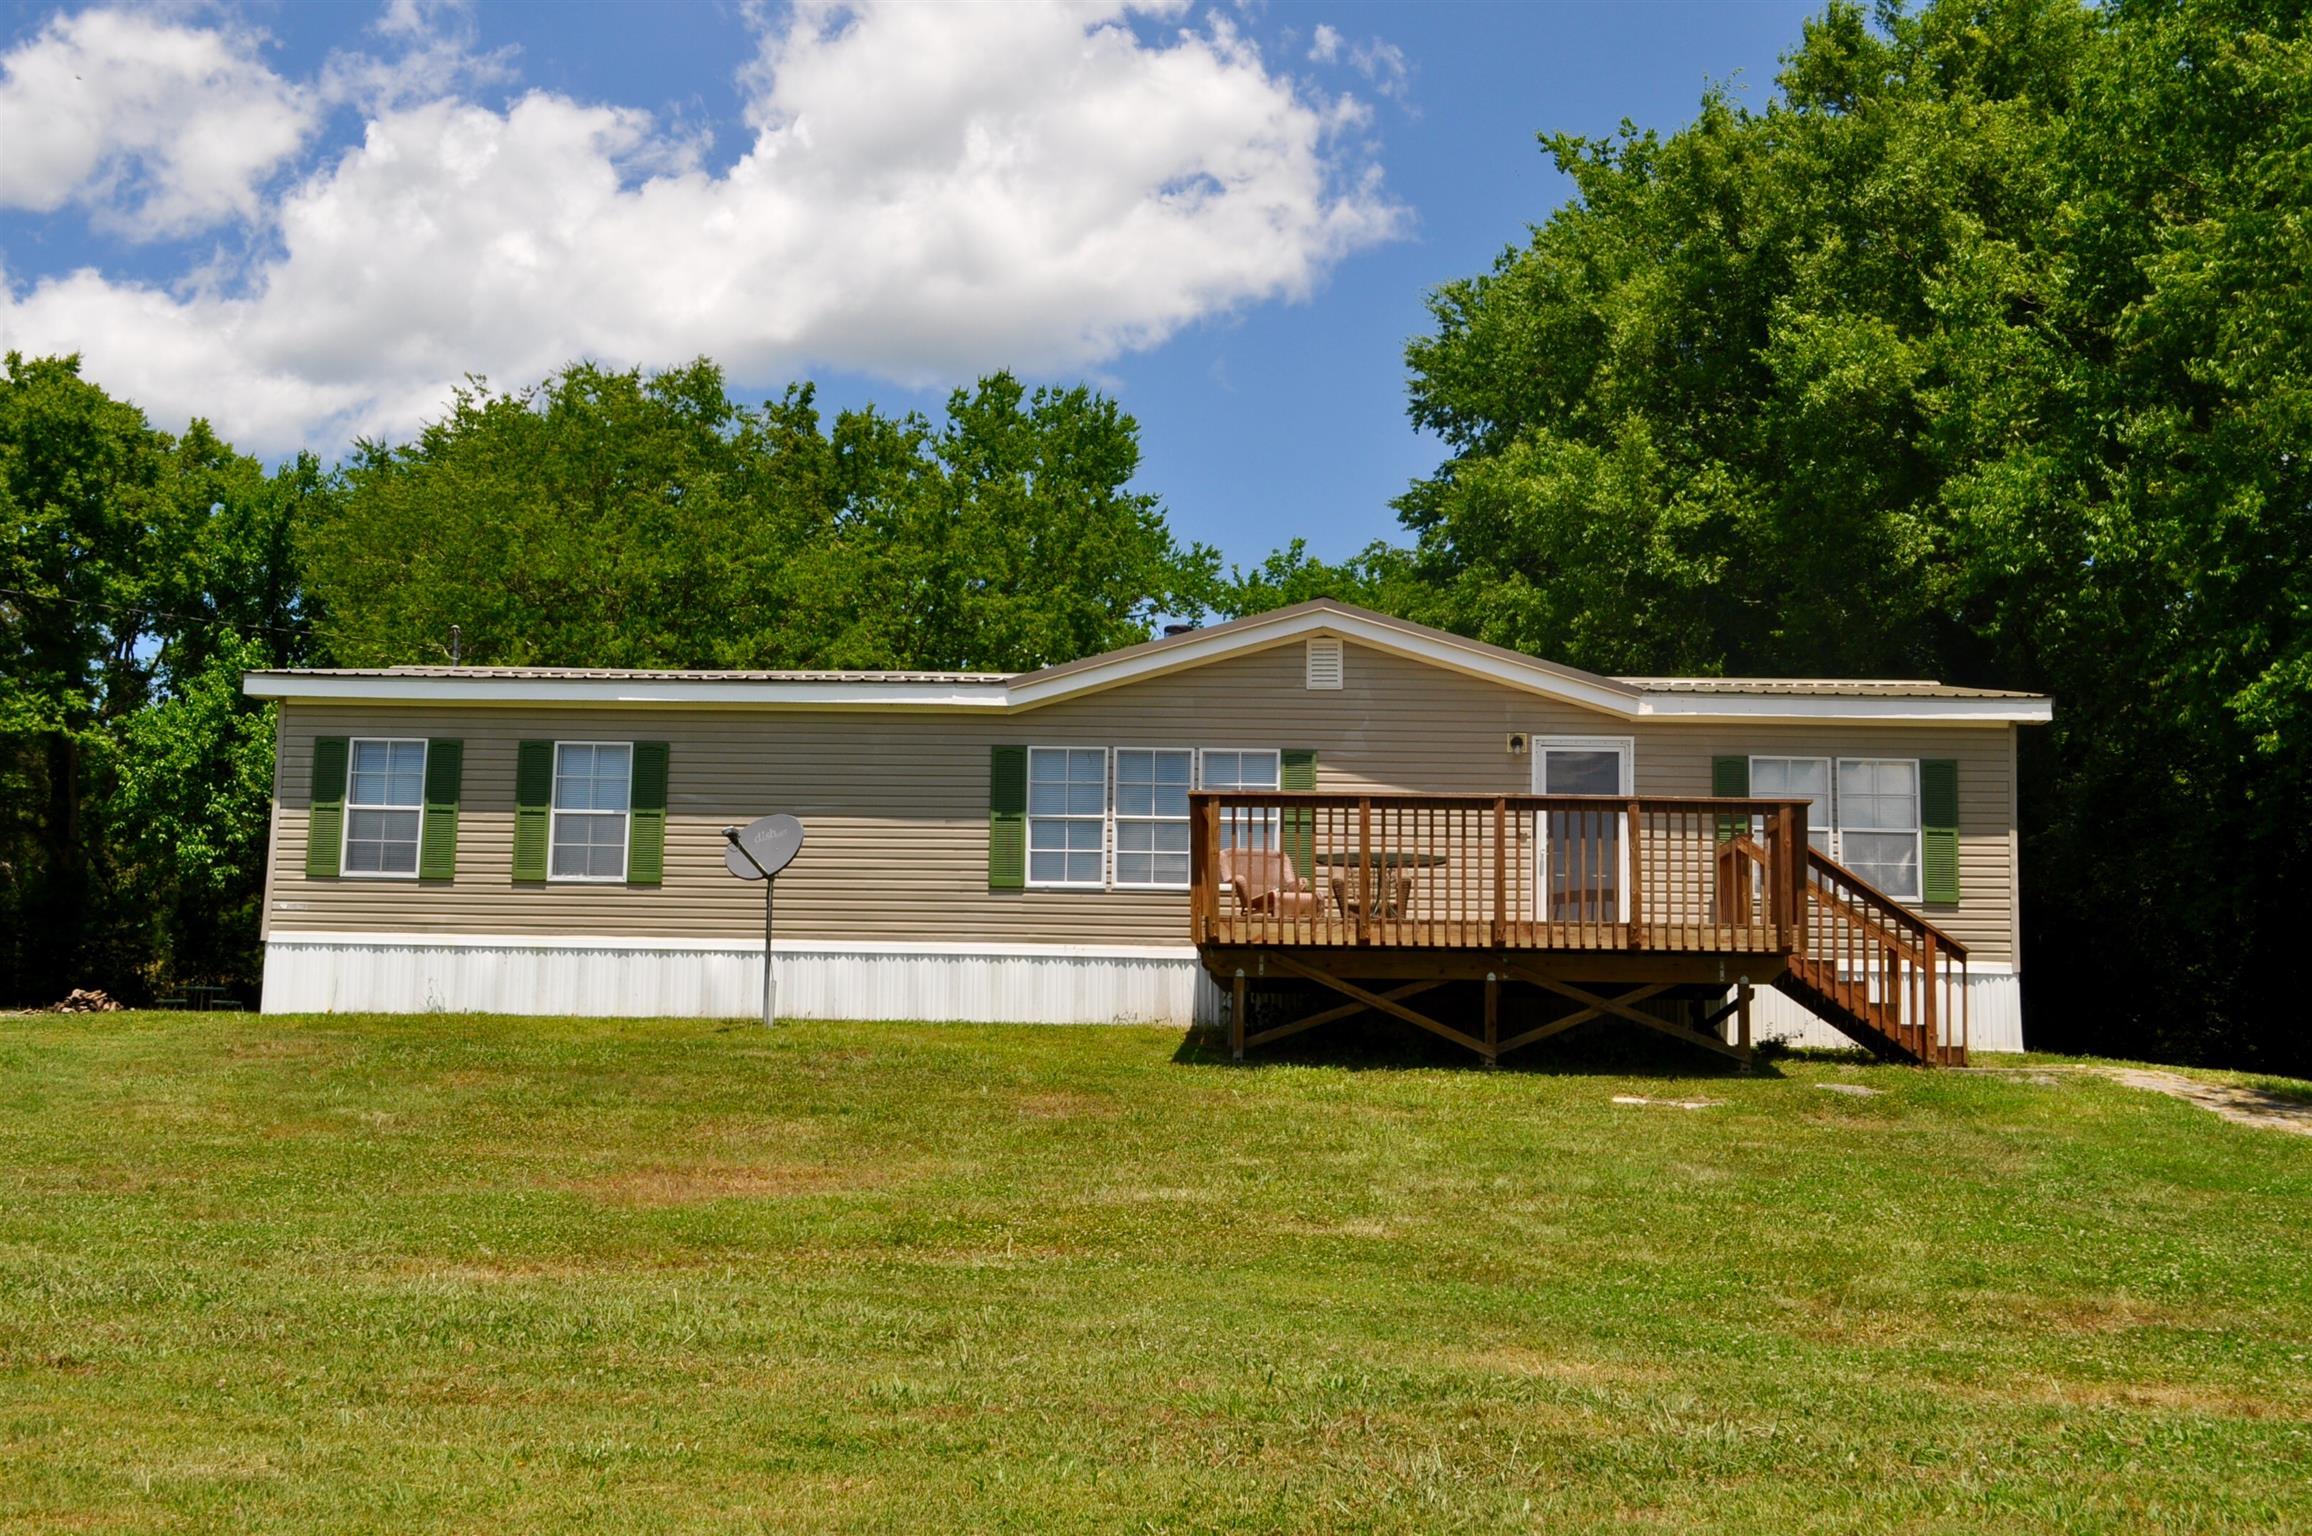 401 Old Elkton Pike, Fayetteville, TN 37334 - Fayetteville, TN real estate listing